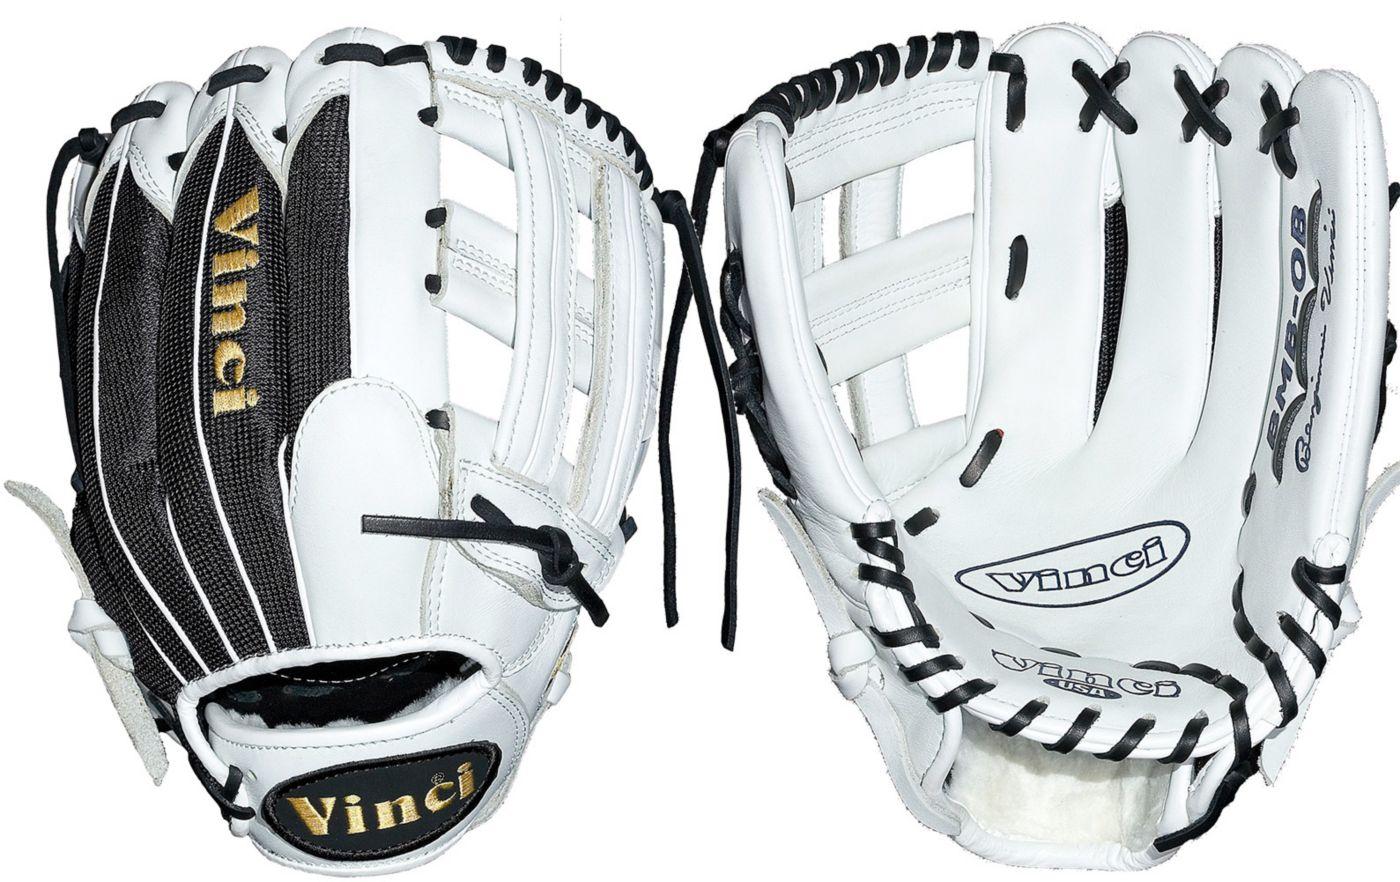 "VINCI 13"" BMB-OB Mesh Series Glove"